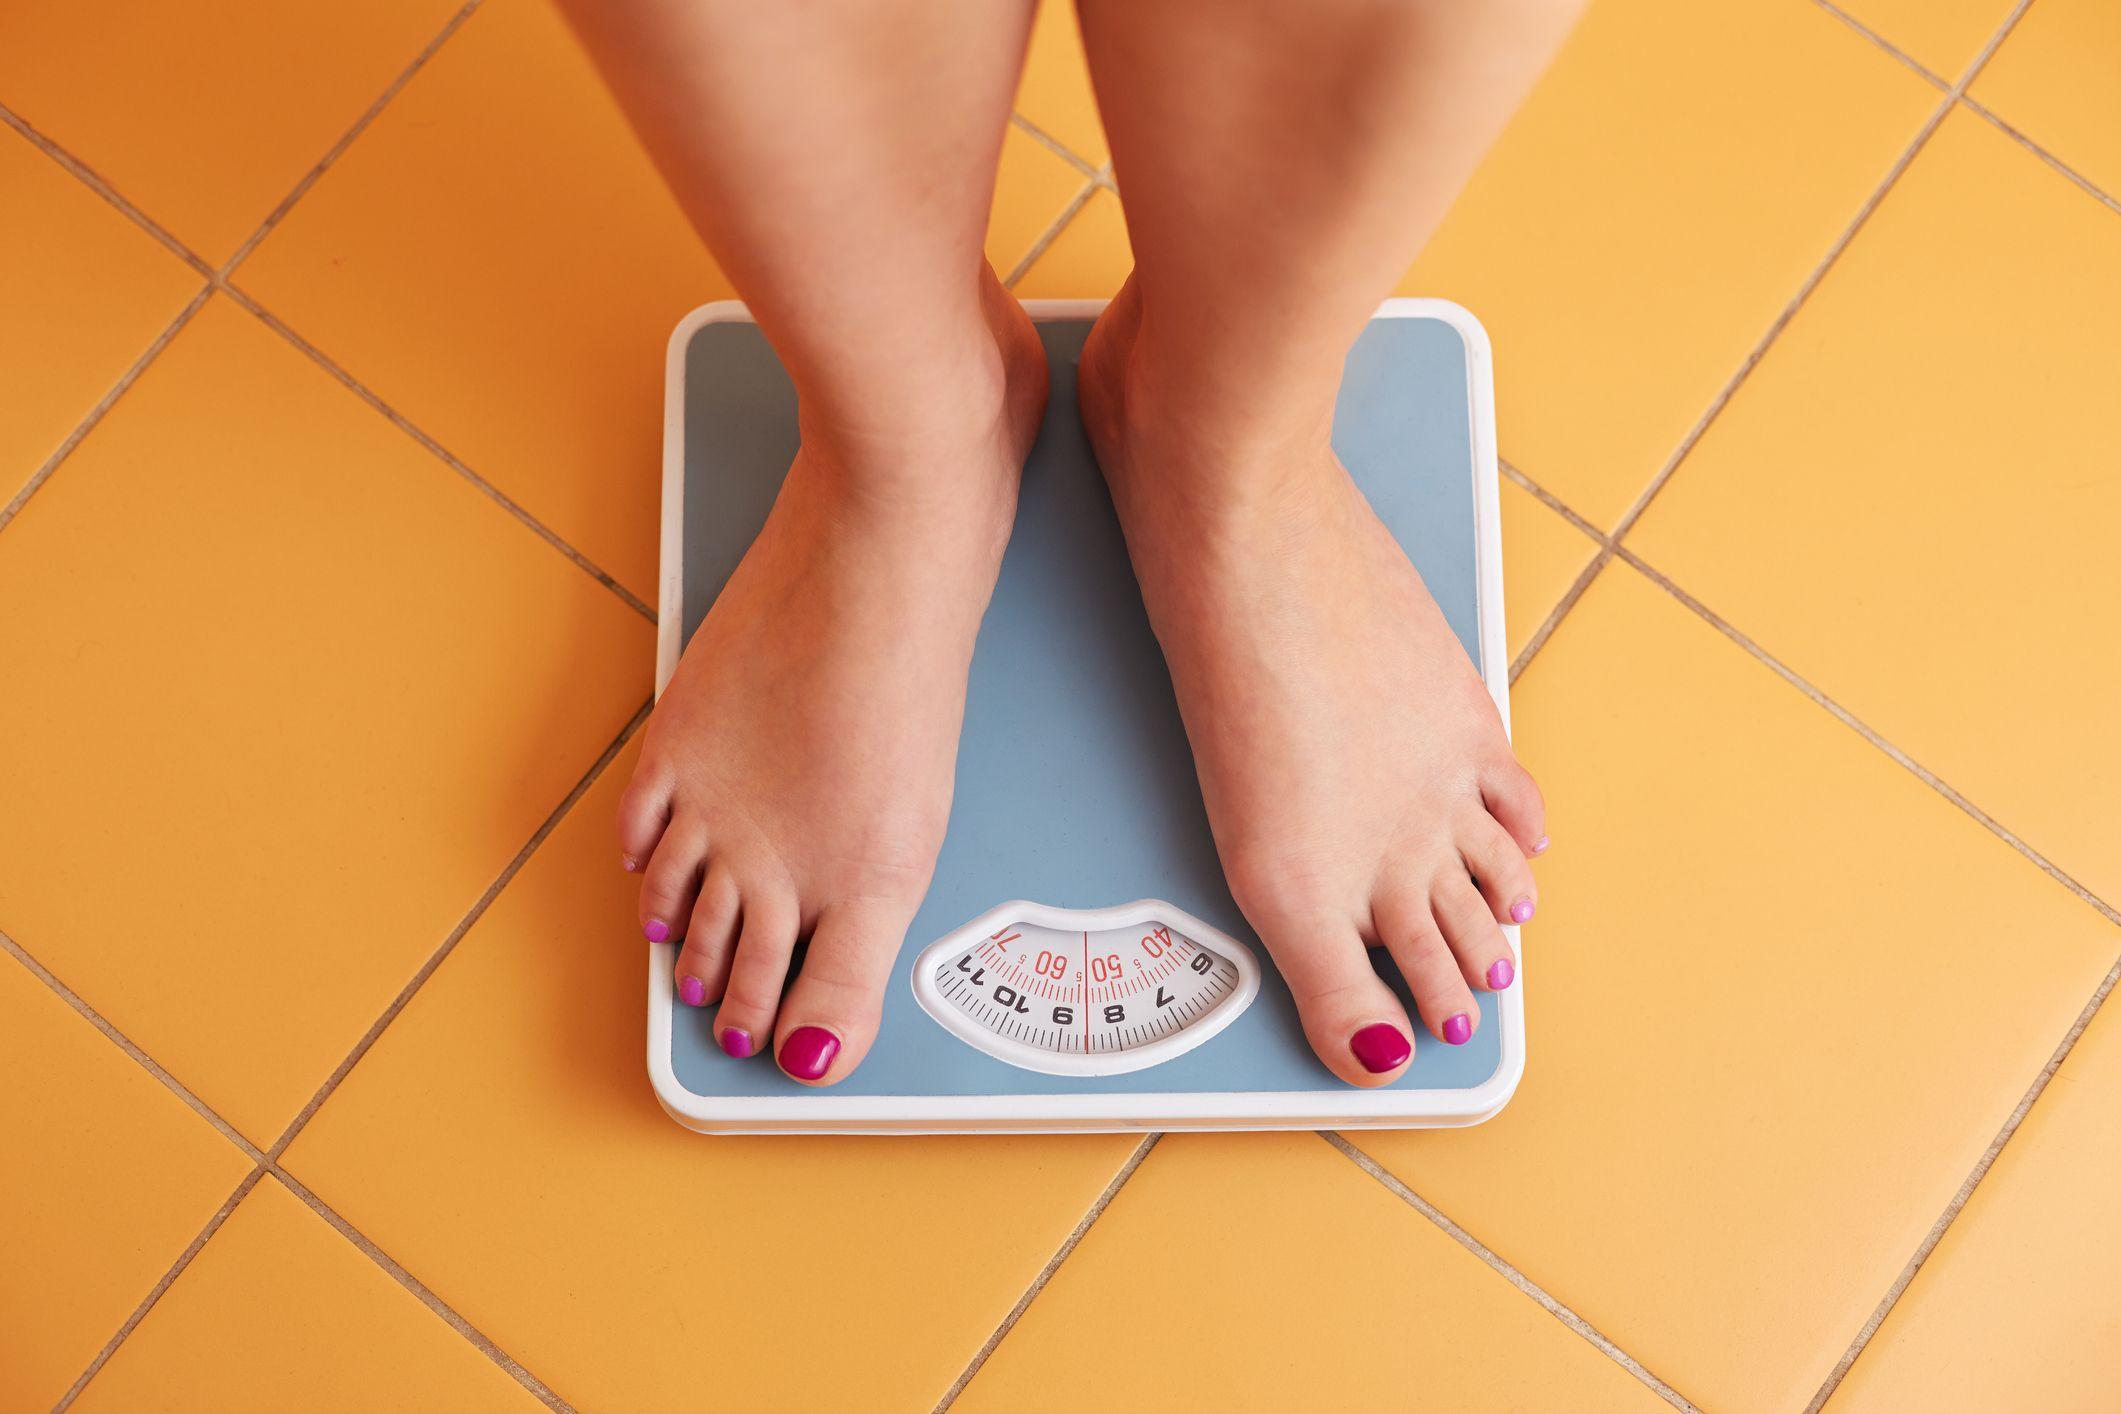 Why do we study metabolism